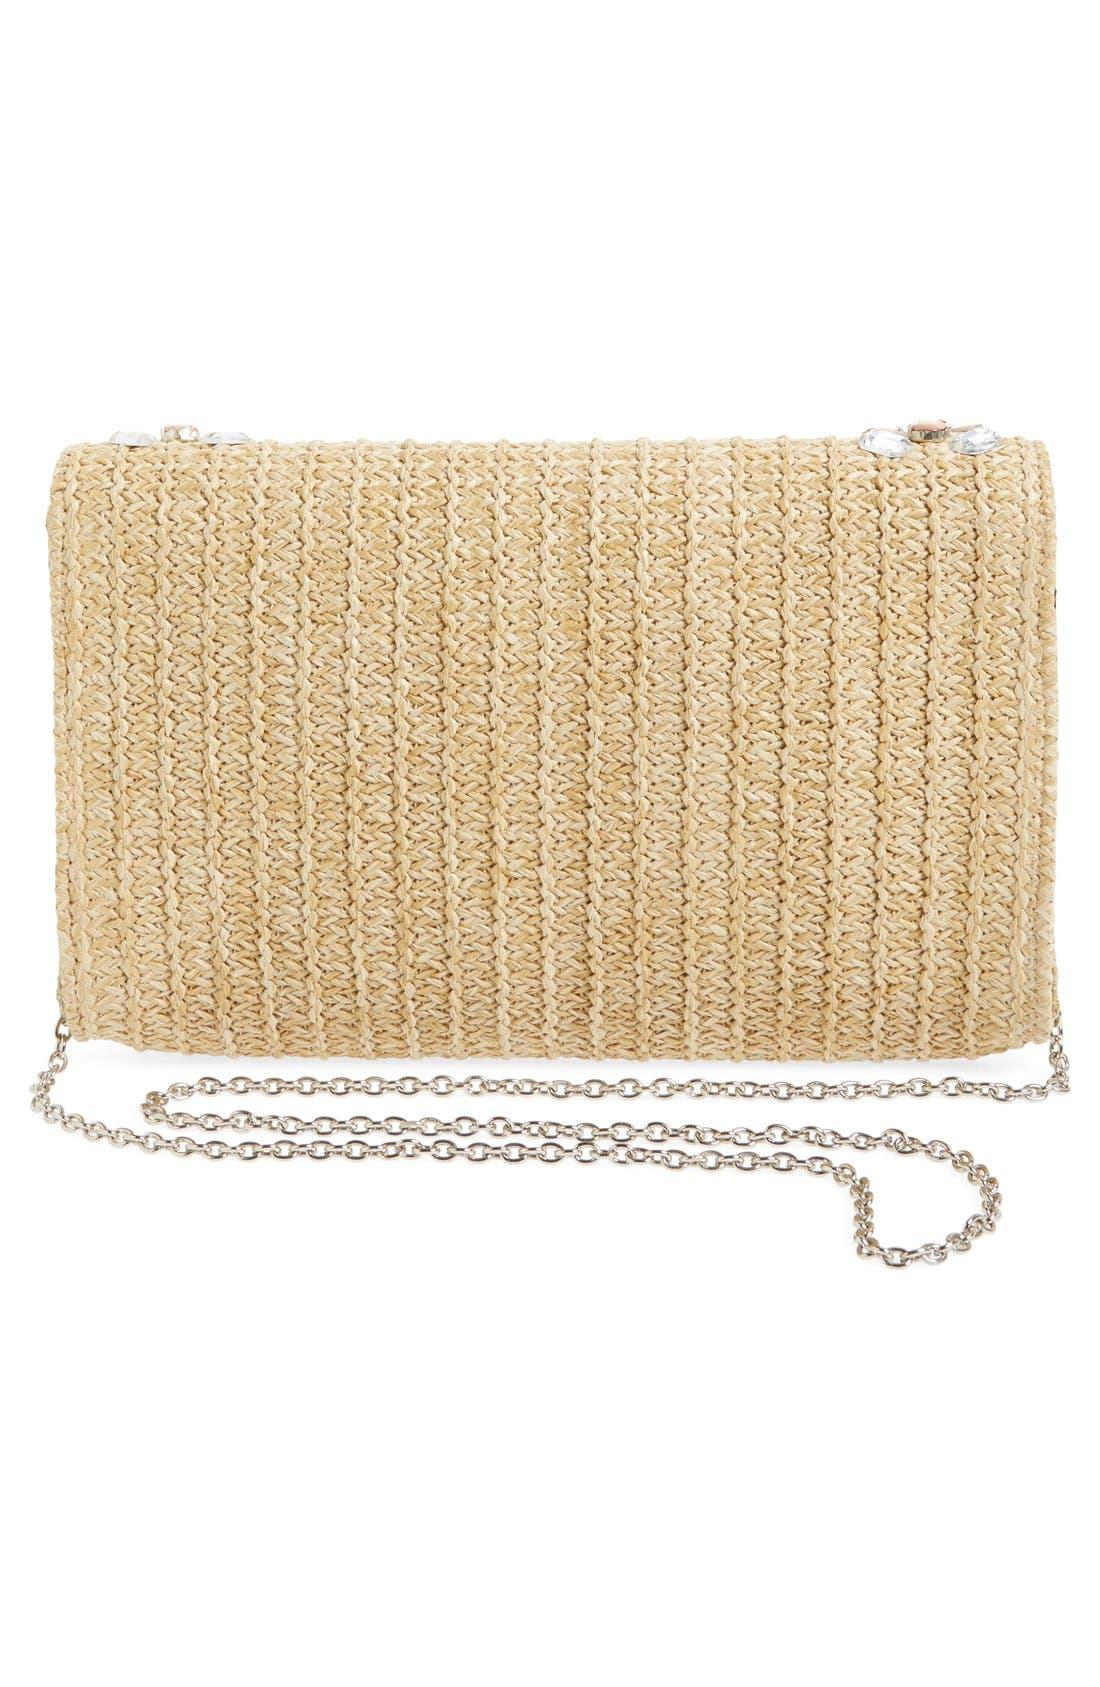 Alternate Image 3  - Glint Embellished Straw Clutch